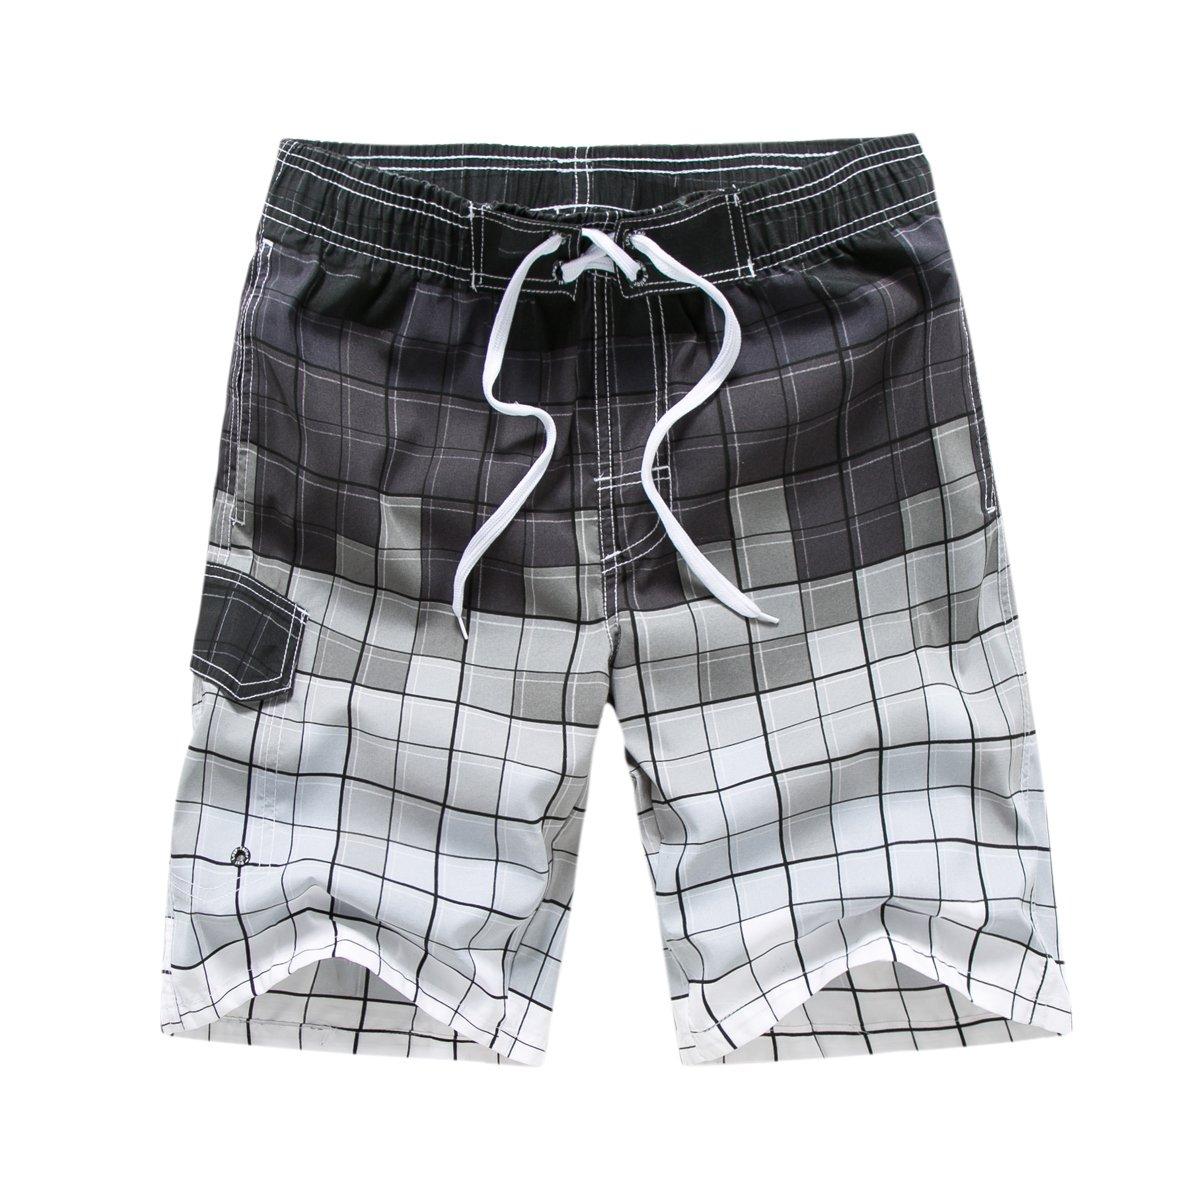 Dfrei Hombre Manner cuadrícula Patrón Secado Rápido Bañador Beachs Pantalones Cortos Bañador Verano Playa